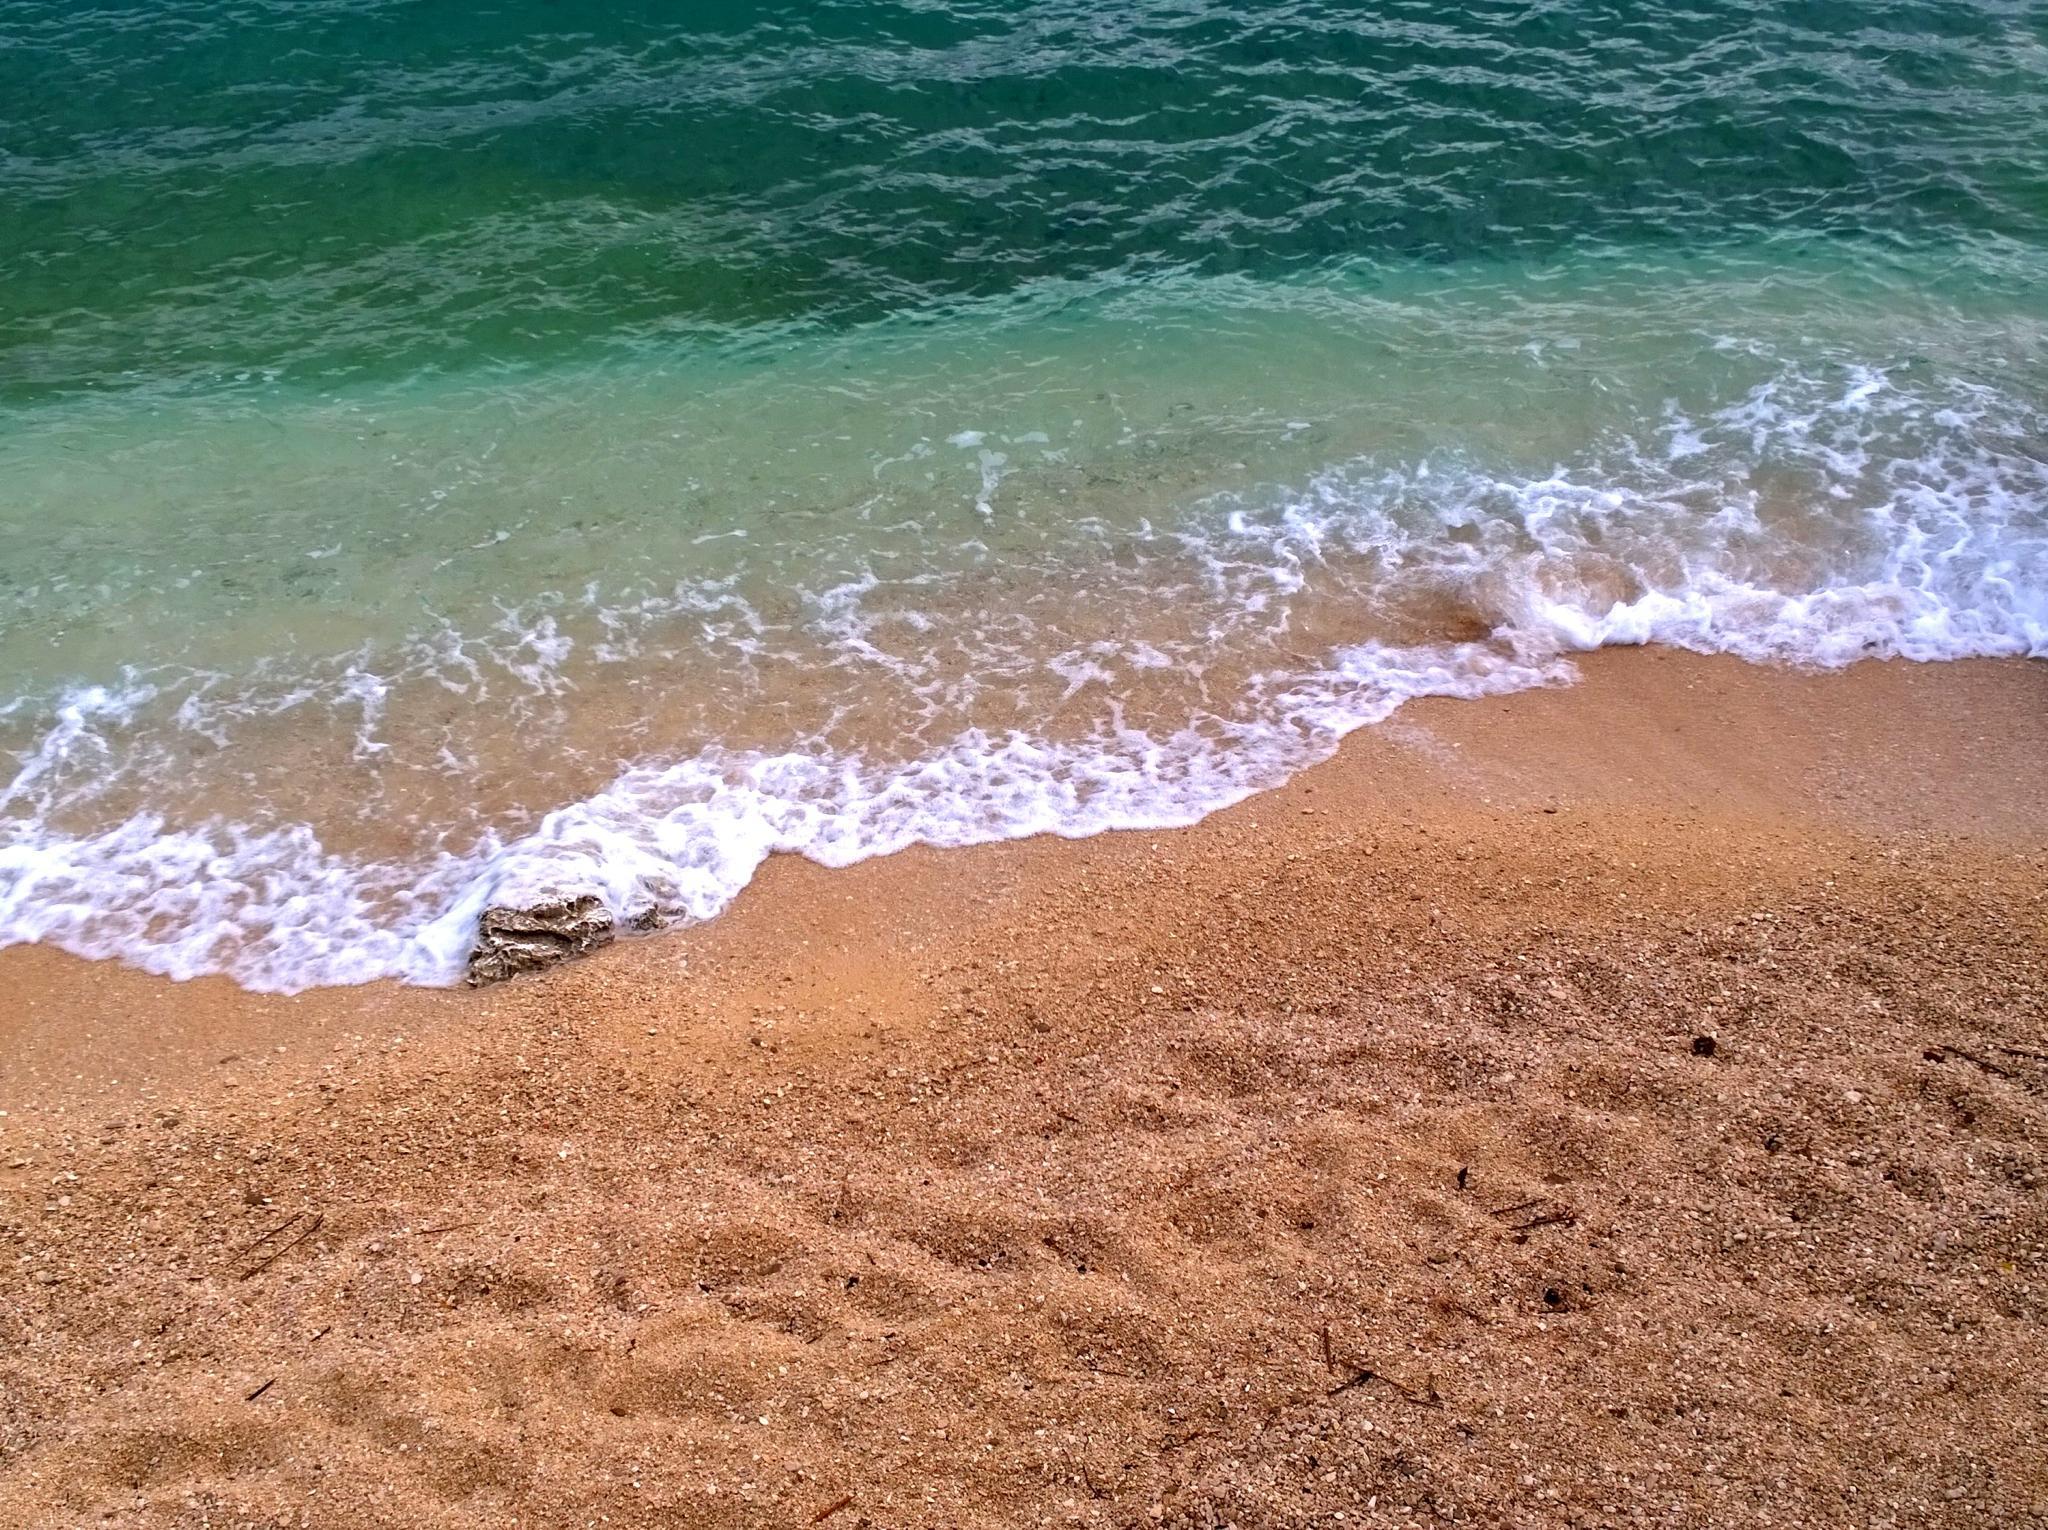 Sea and sand by Stipe Katić